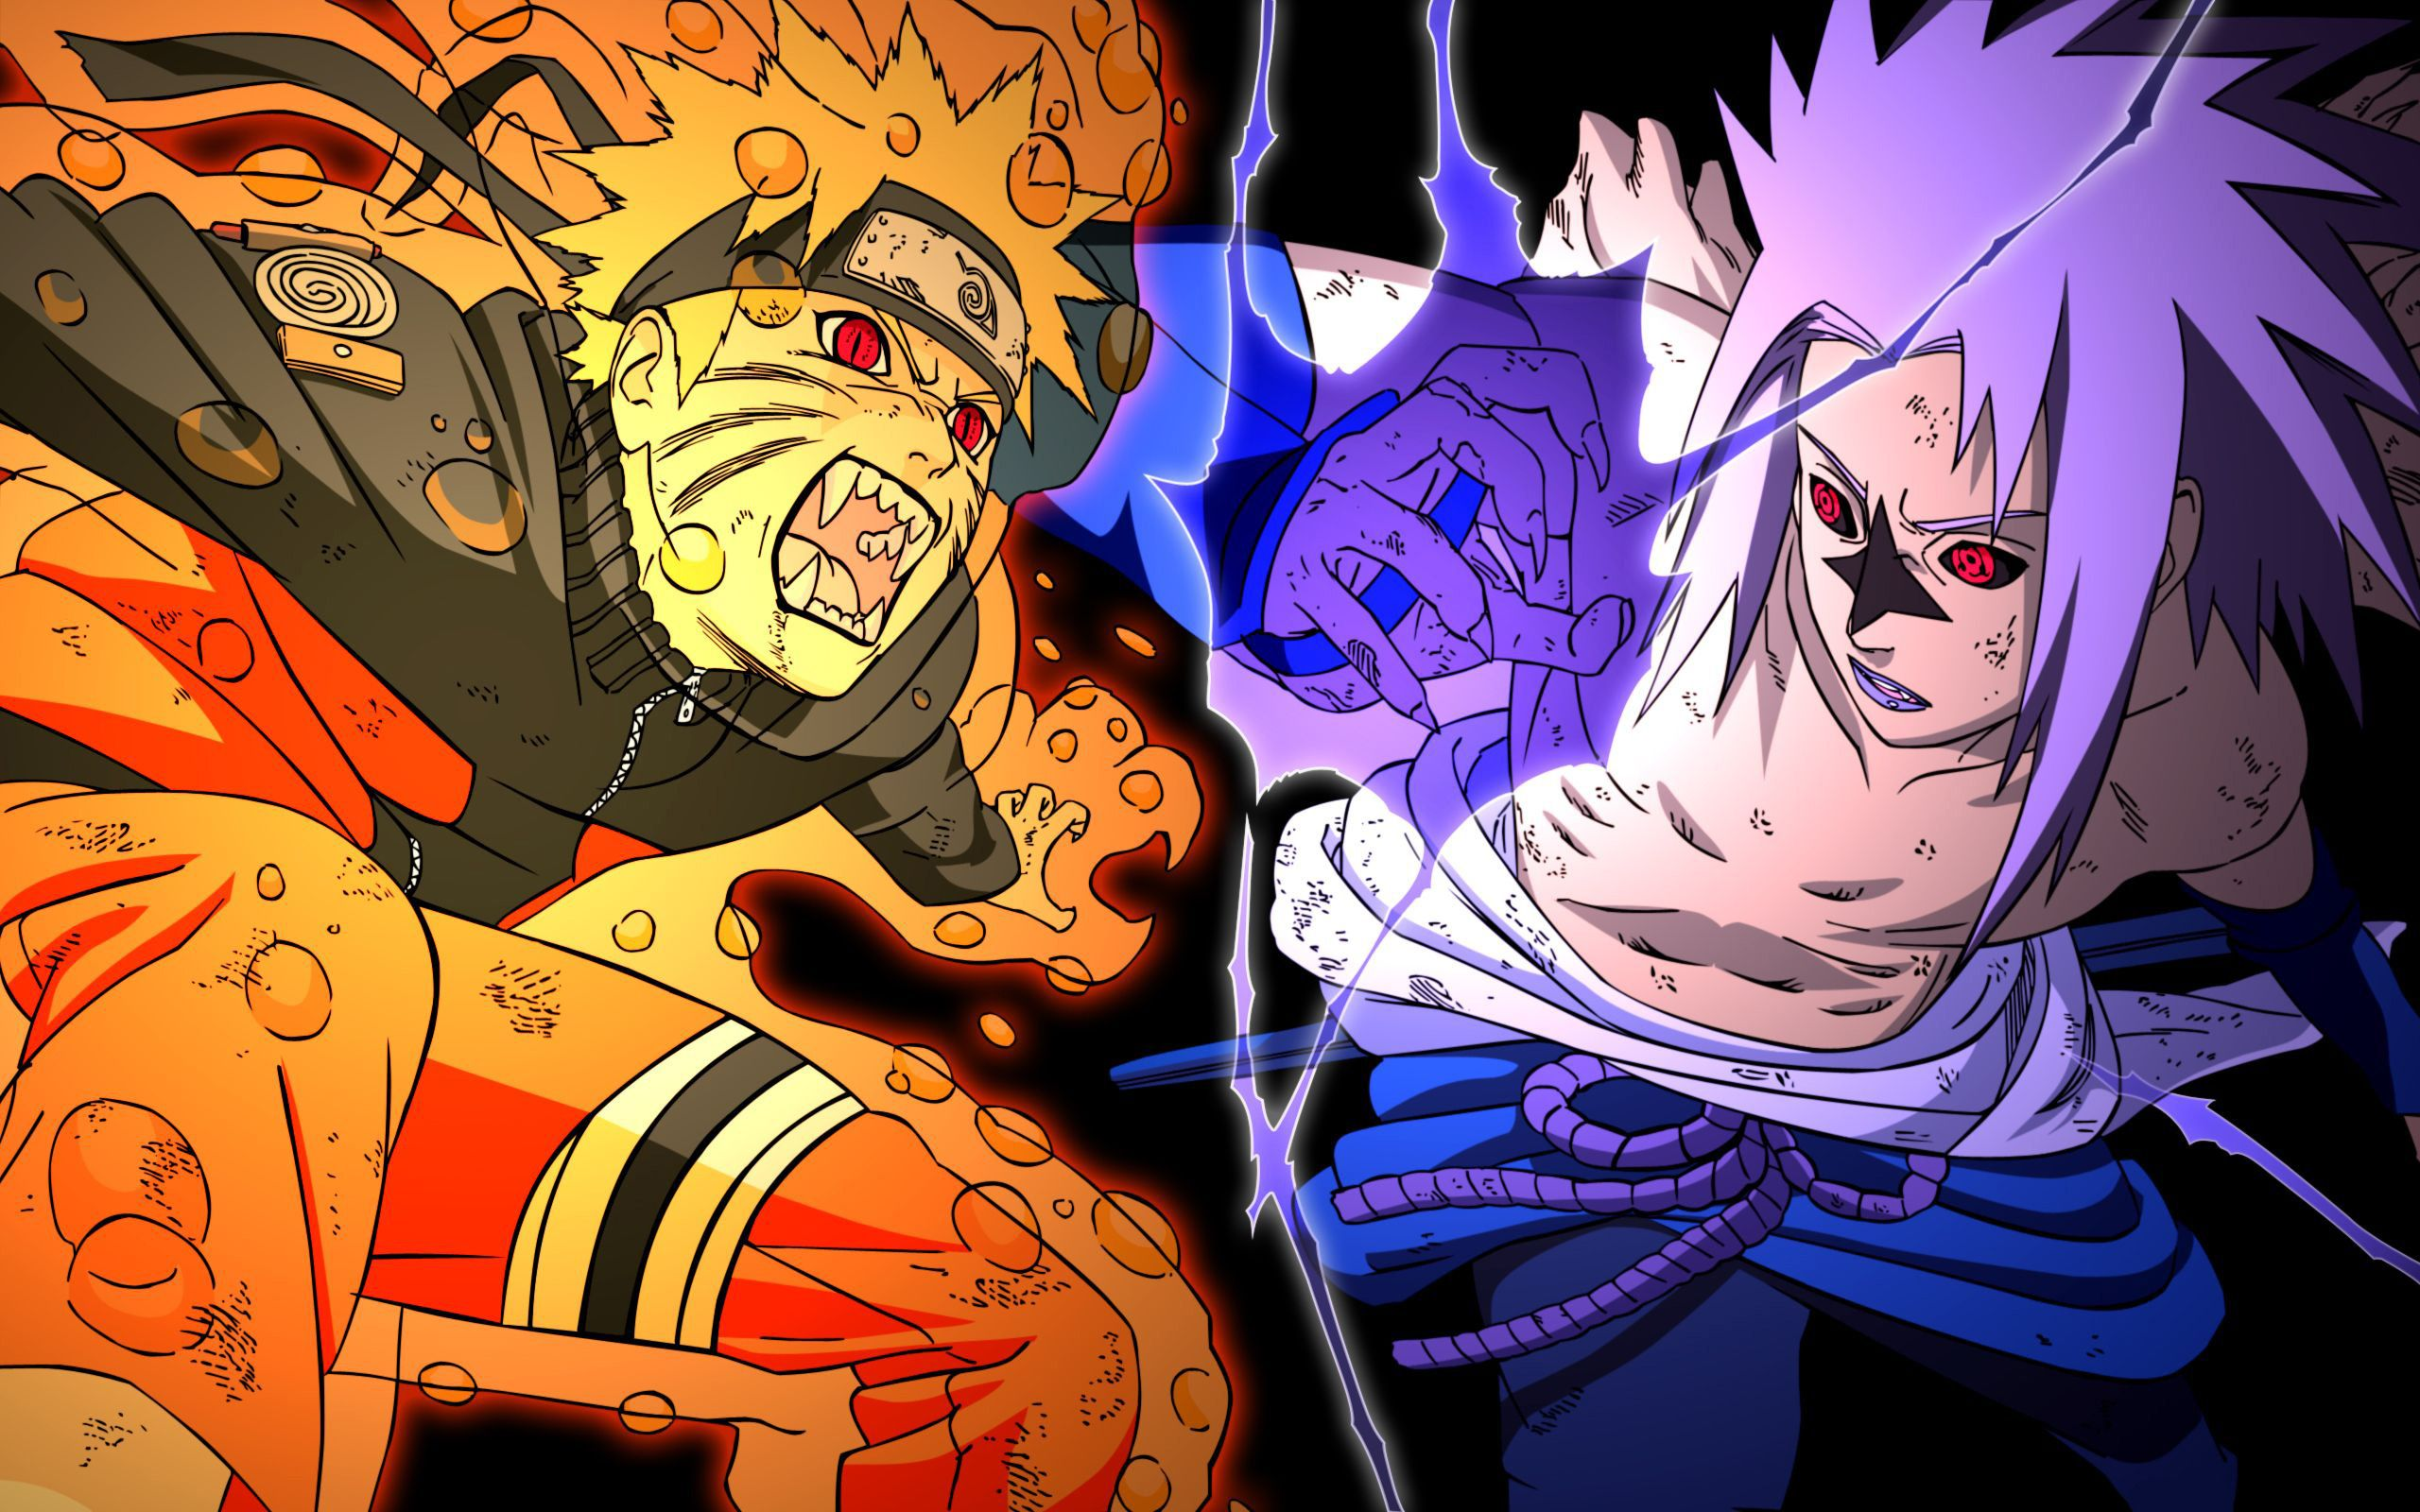 Gambar Naruto Vs Sasuke Wallpaper Gudang Wallpaper